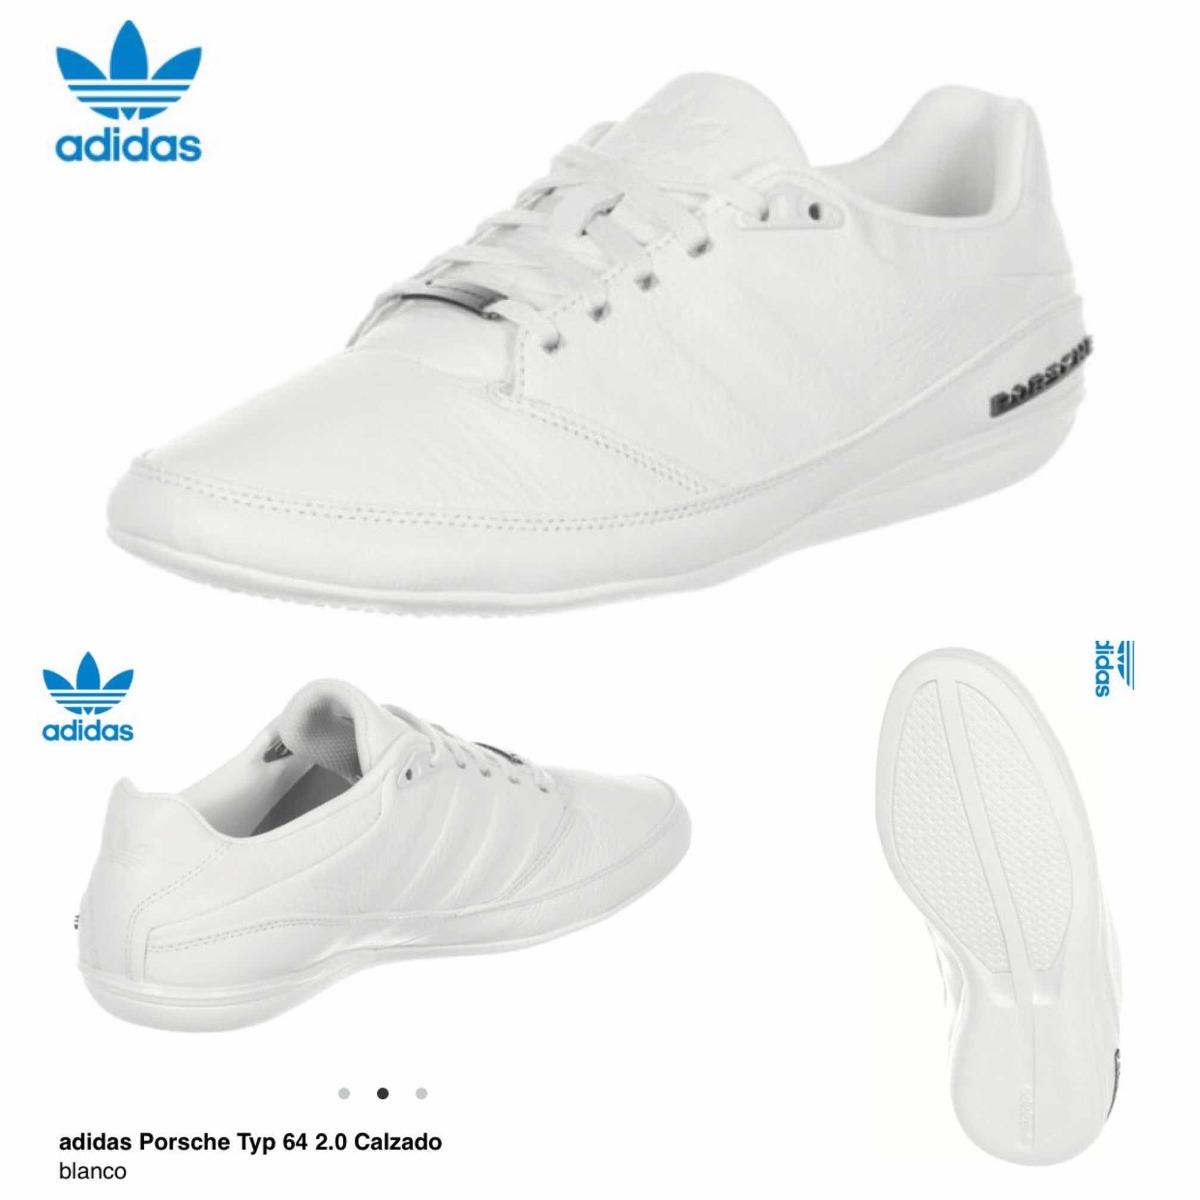 online retailer e5af3 ab1c2 ... new arrivals tenis adidas porsche typ 64 2.0 blanco piel cargando zoom.  4f63b 4cd2a